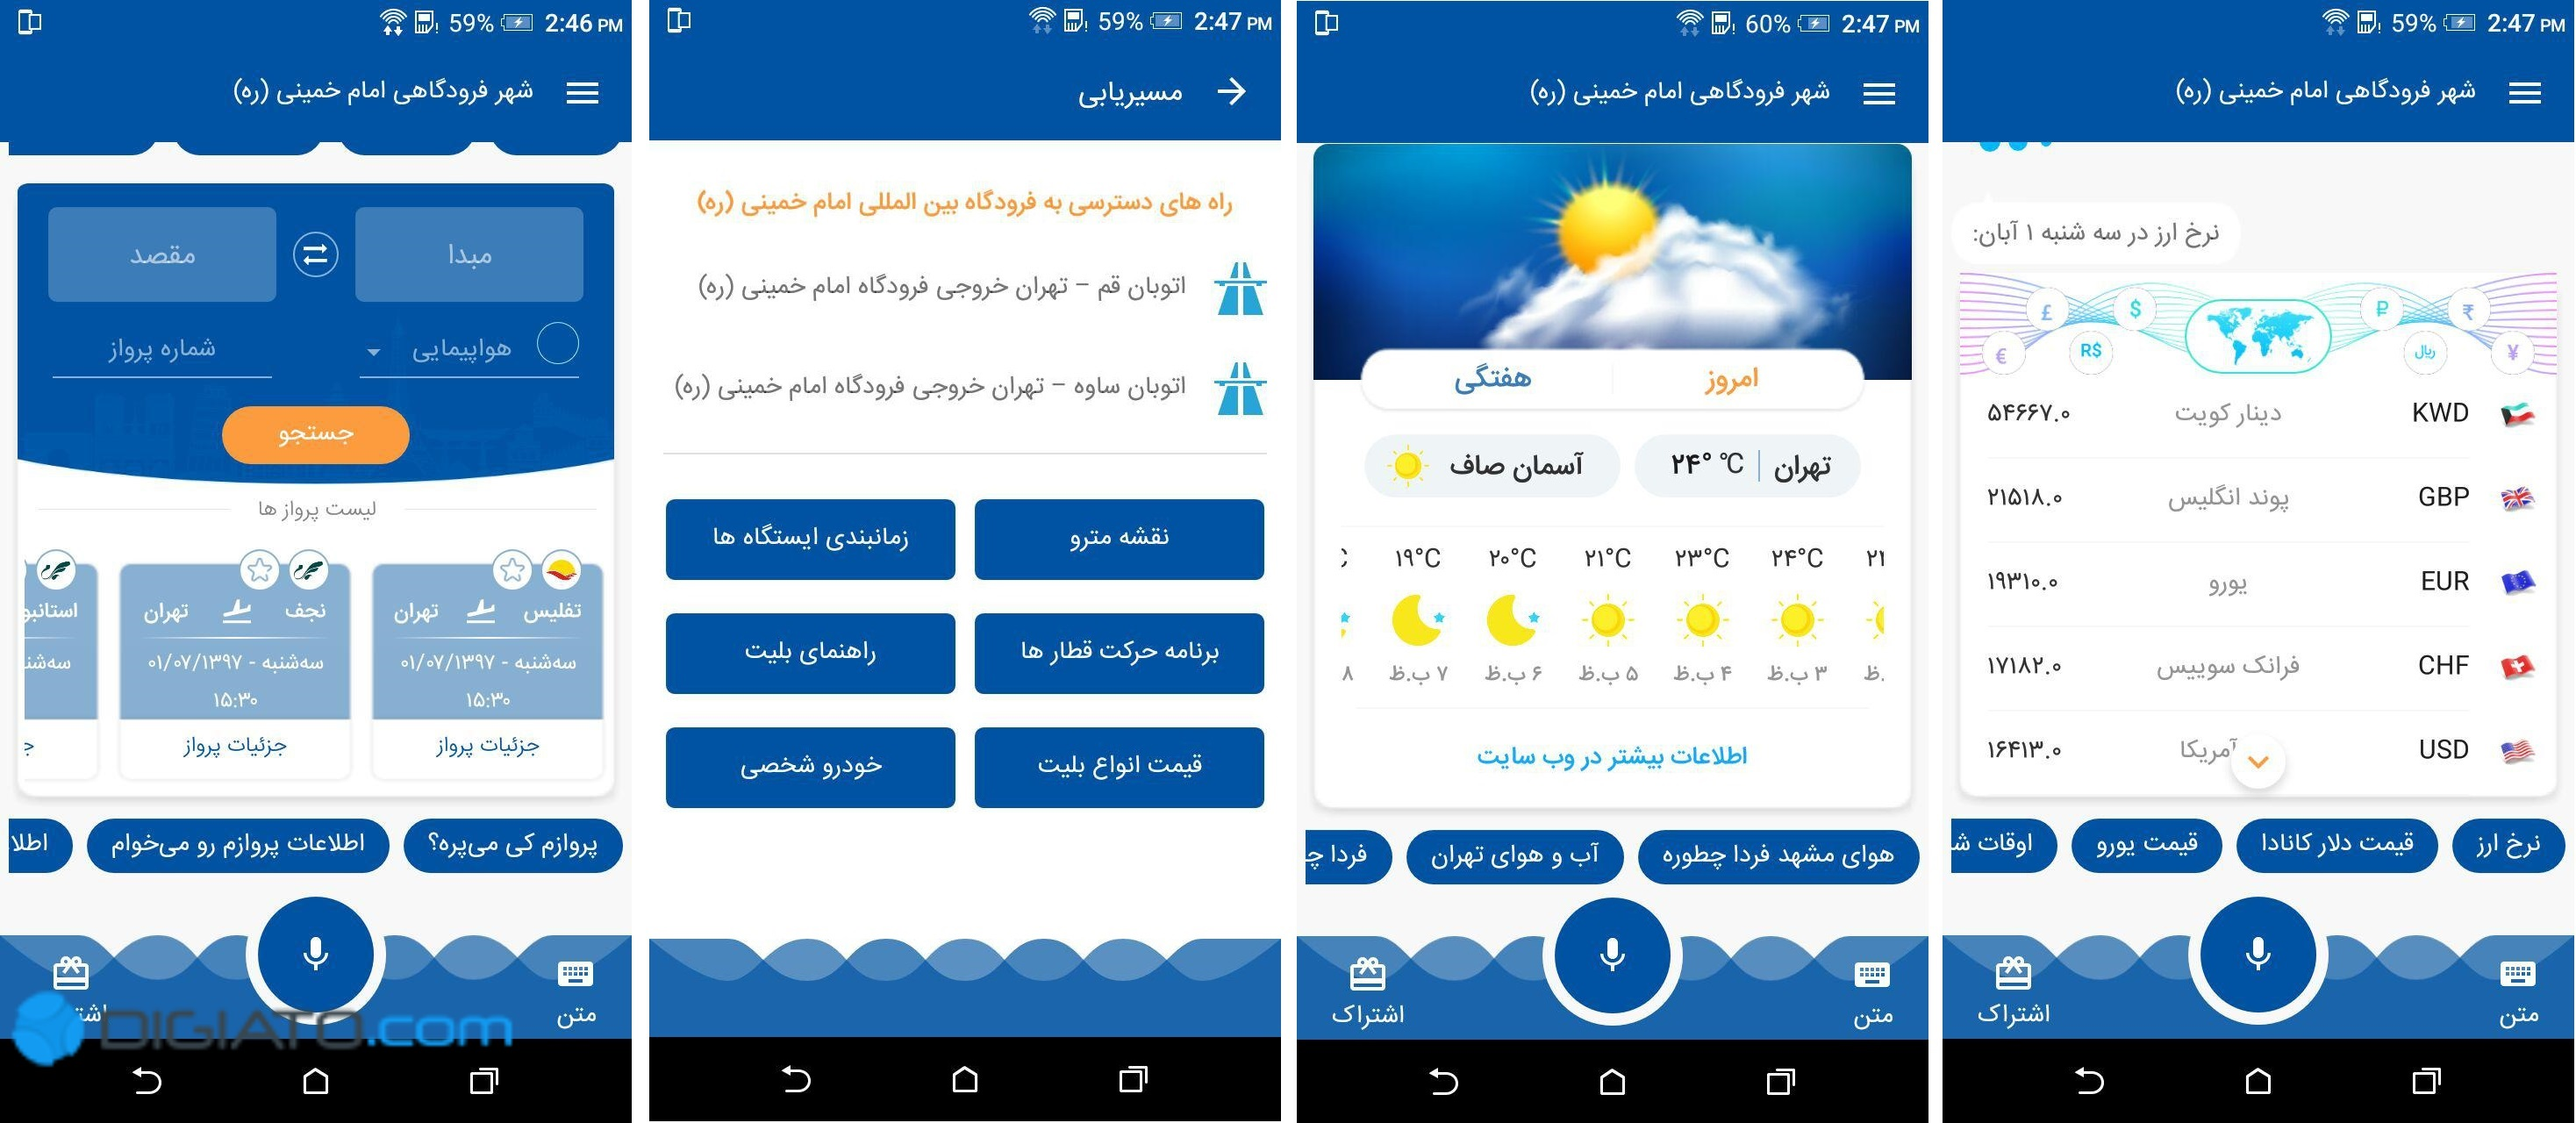 اپلیکیشن فرودگاه امام خمینی